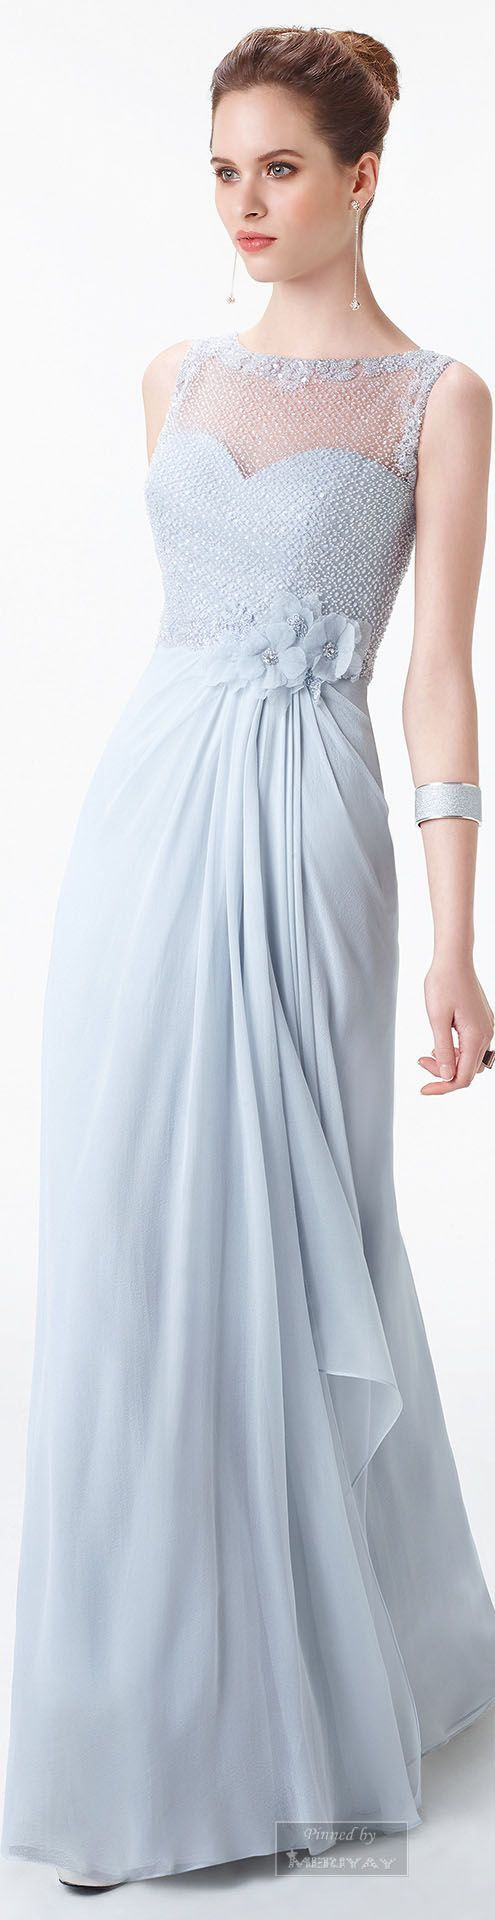 Dfabdbfcfaea vestidos pinterest gowns